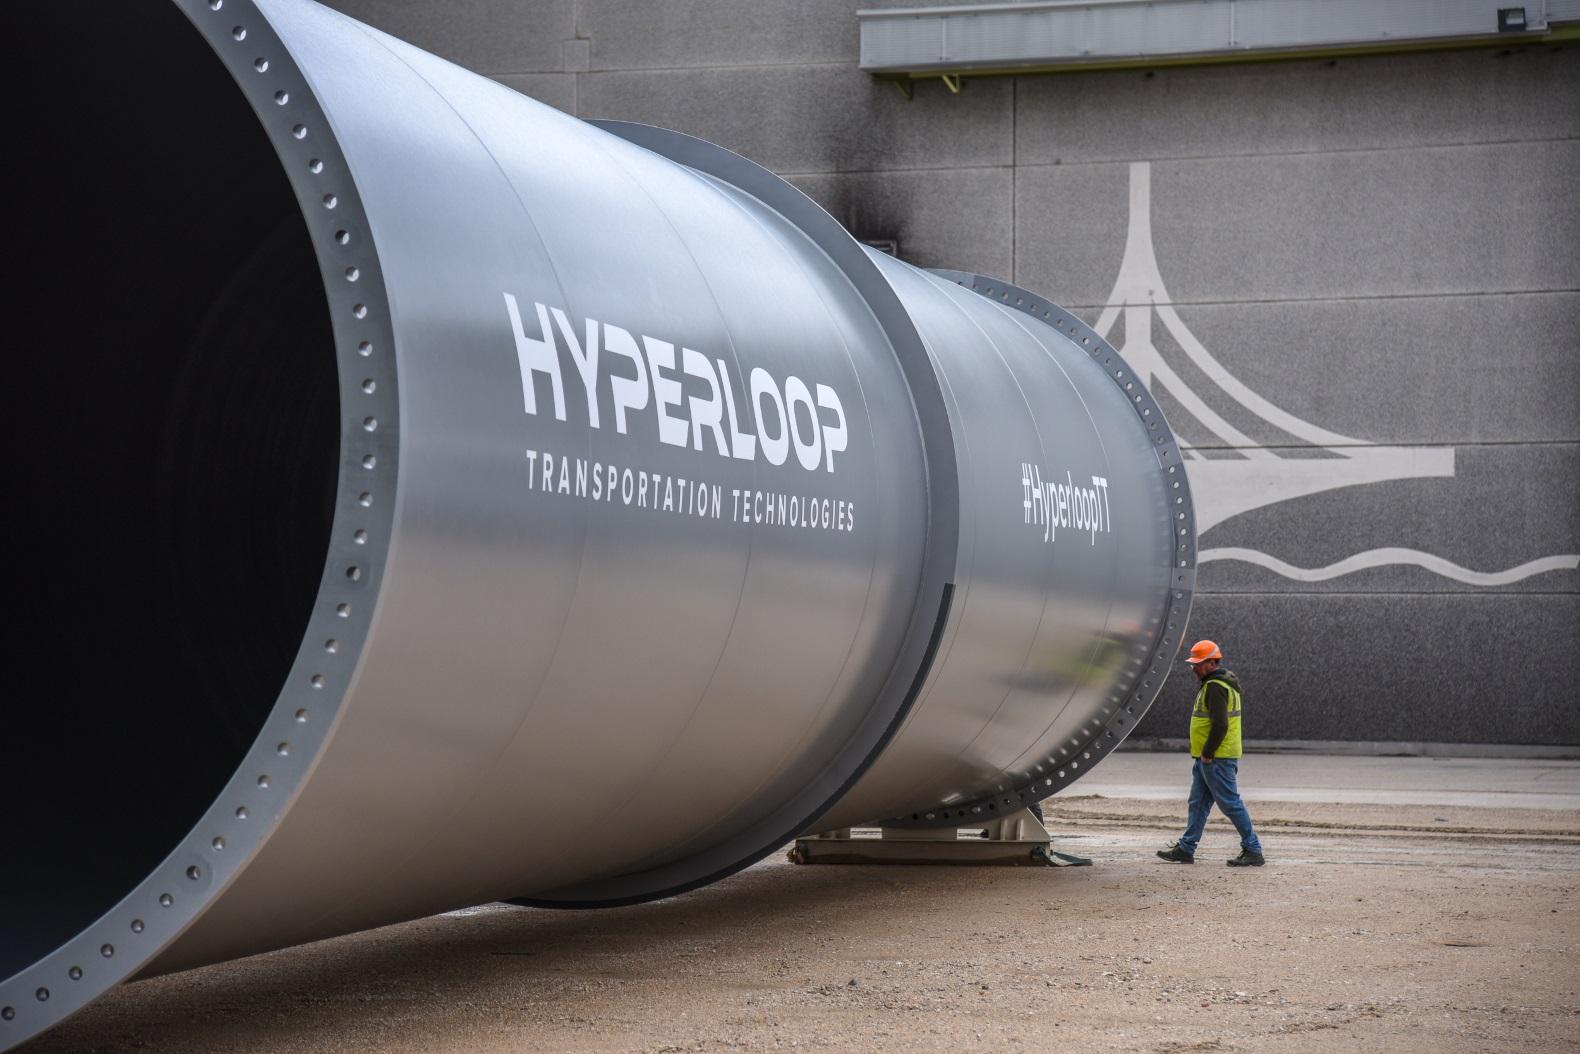 HypeTransportation Technologies